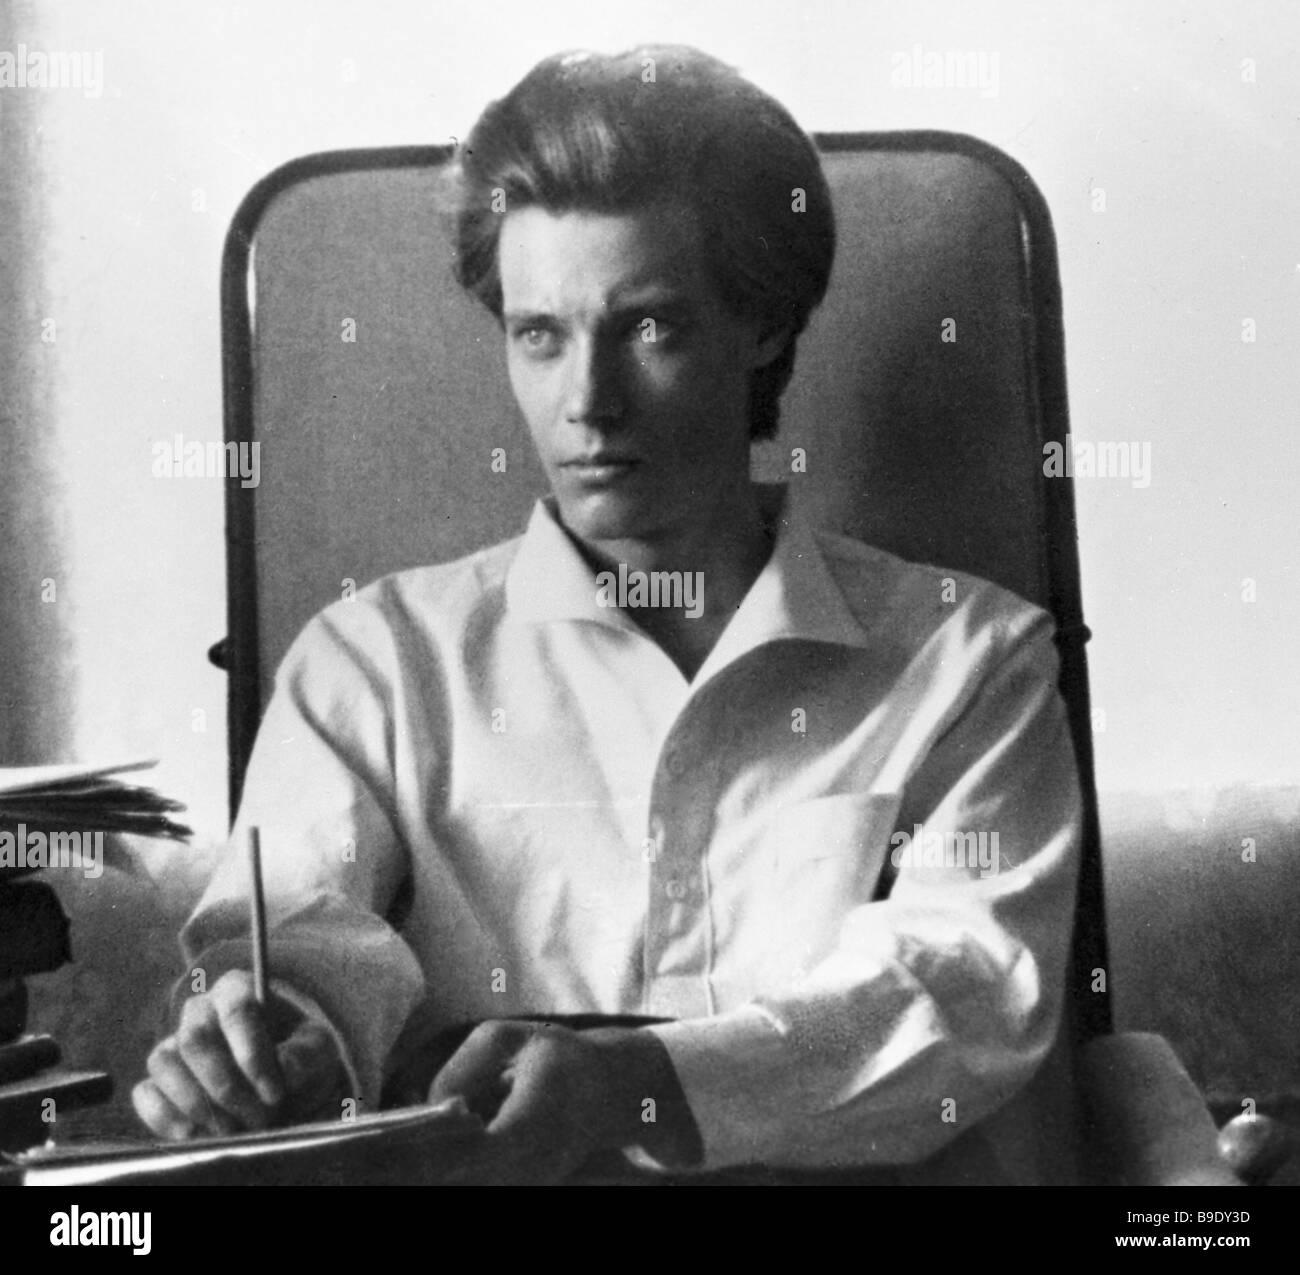 Personal life of Vladimir Konkin 81